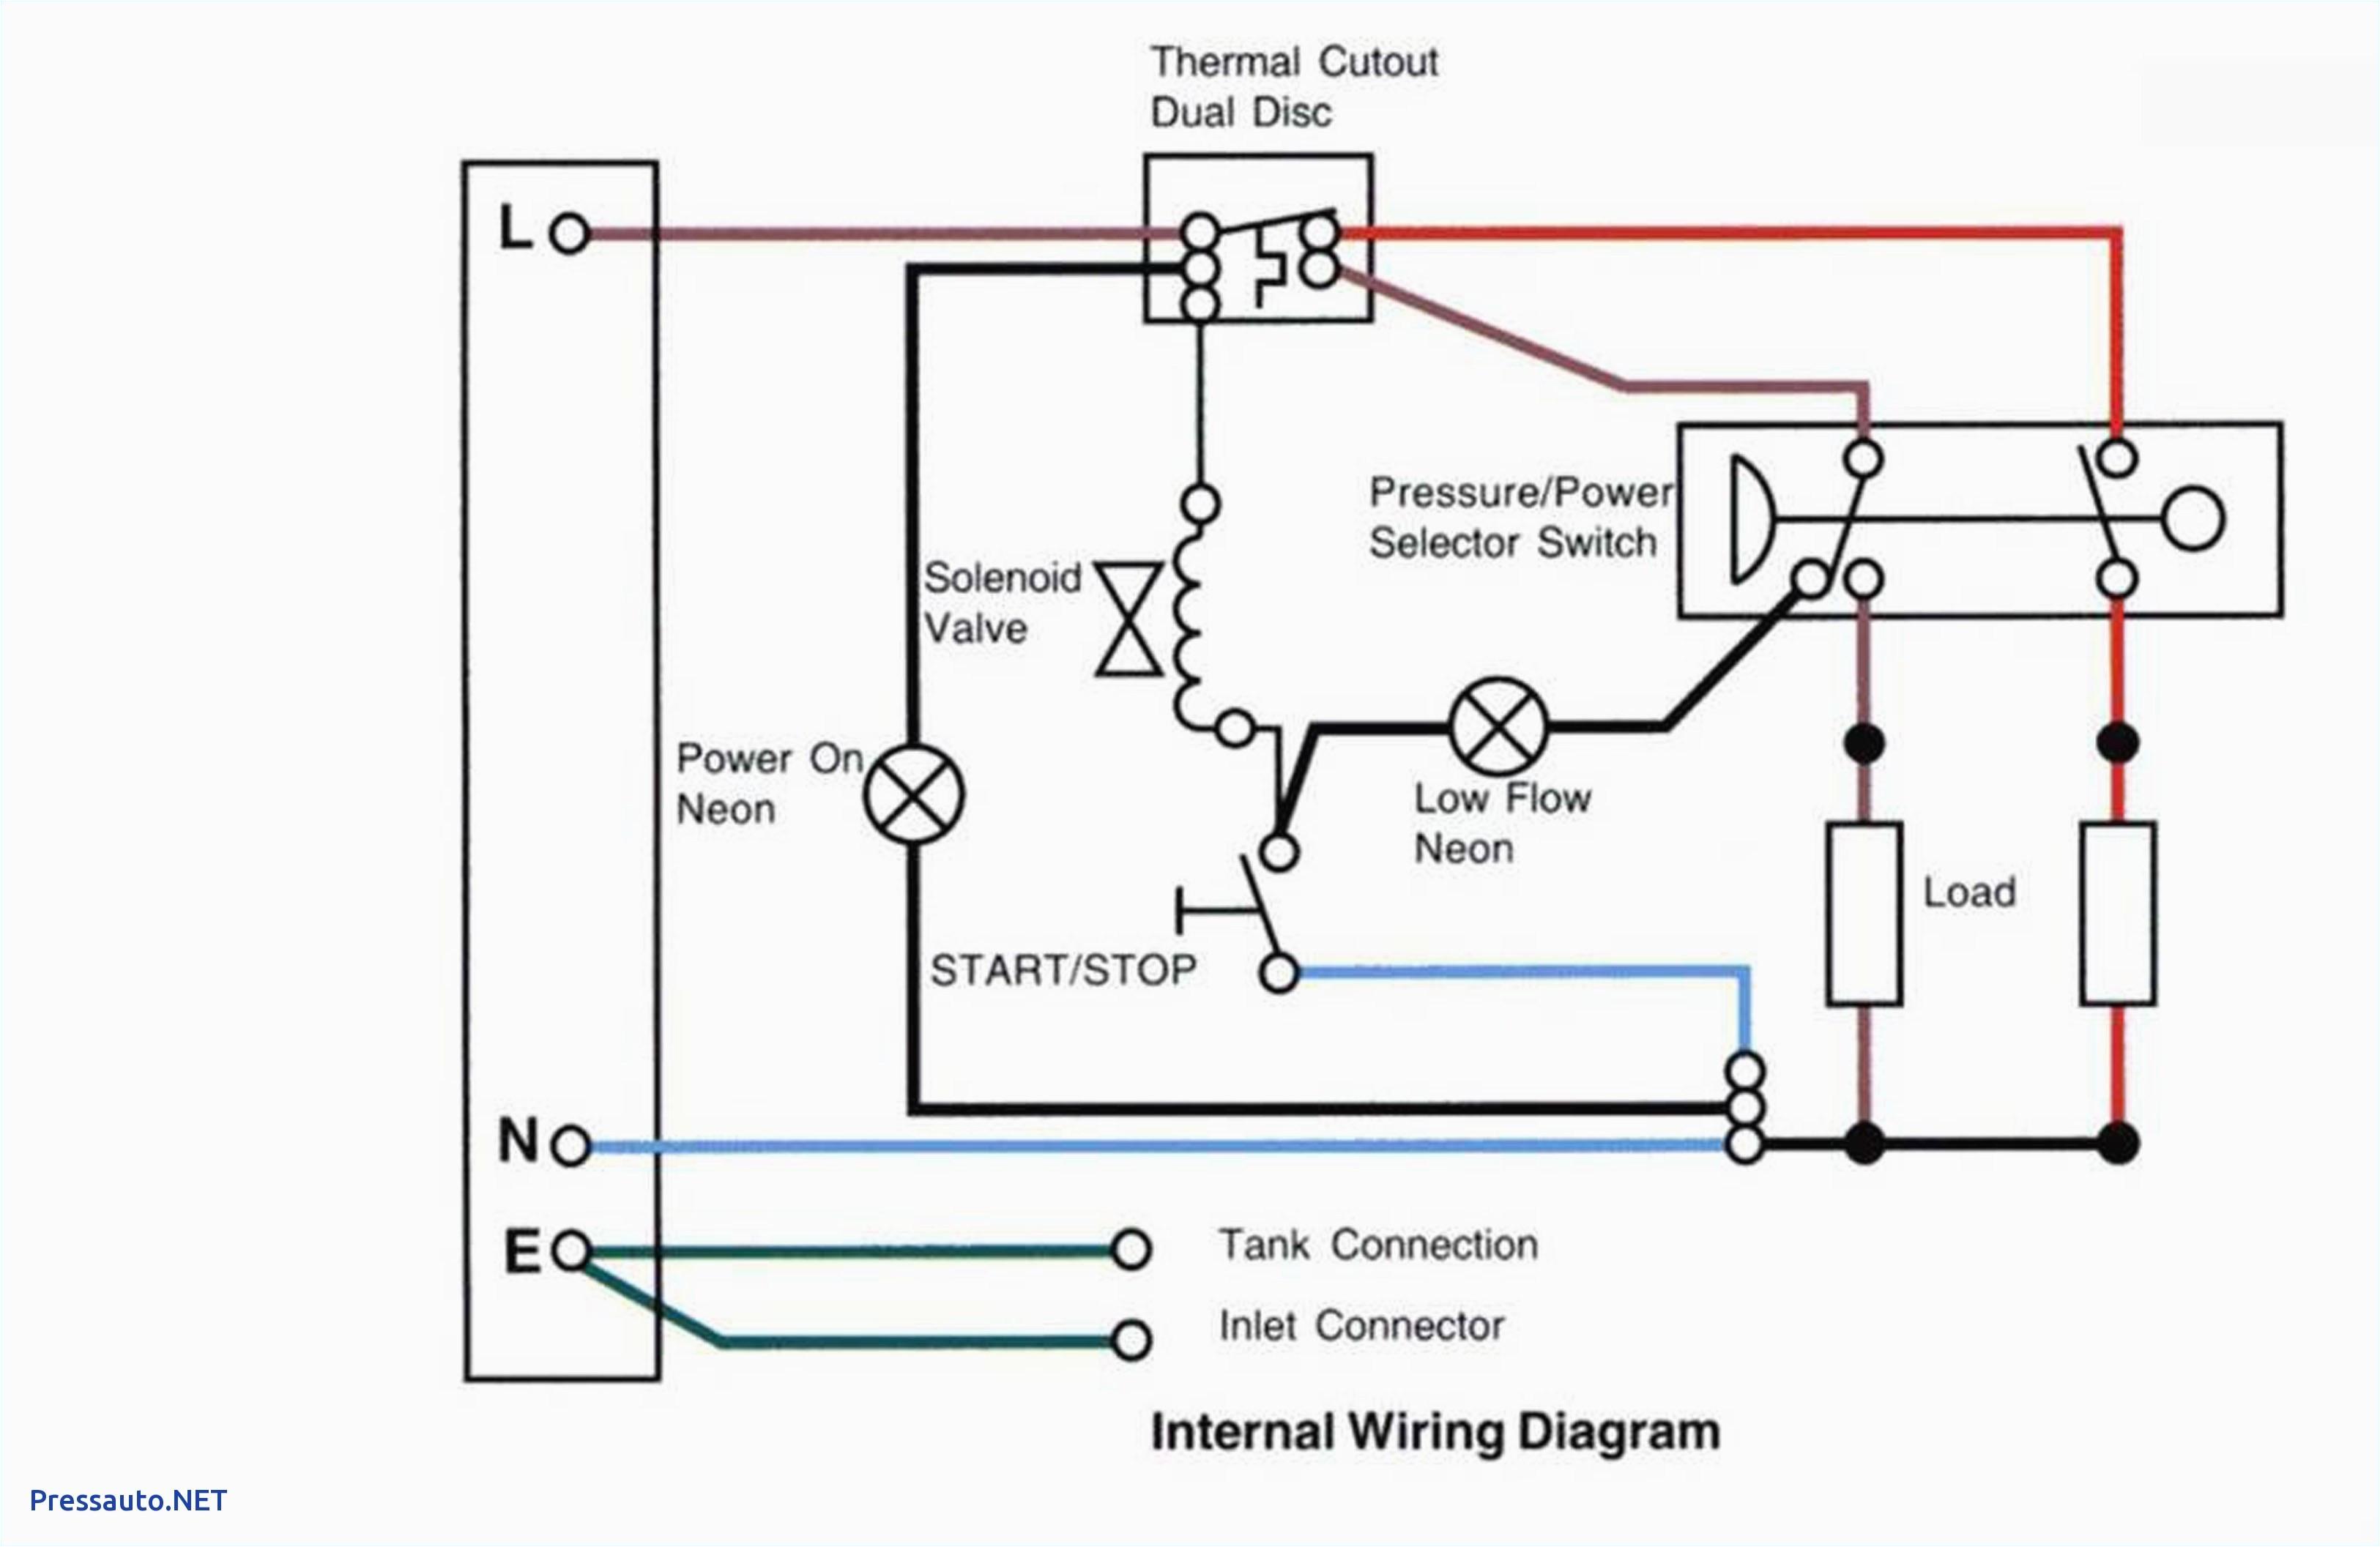 muncie pto wiring diagram wiring diagram articlemuncie pto wiring diagram wiring diagram ame muncie pto wiring